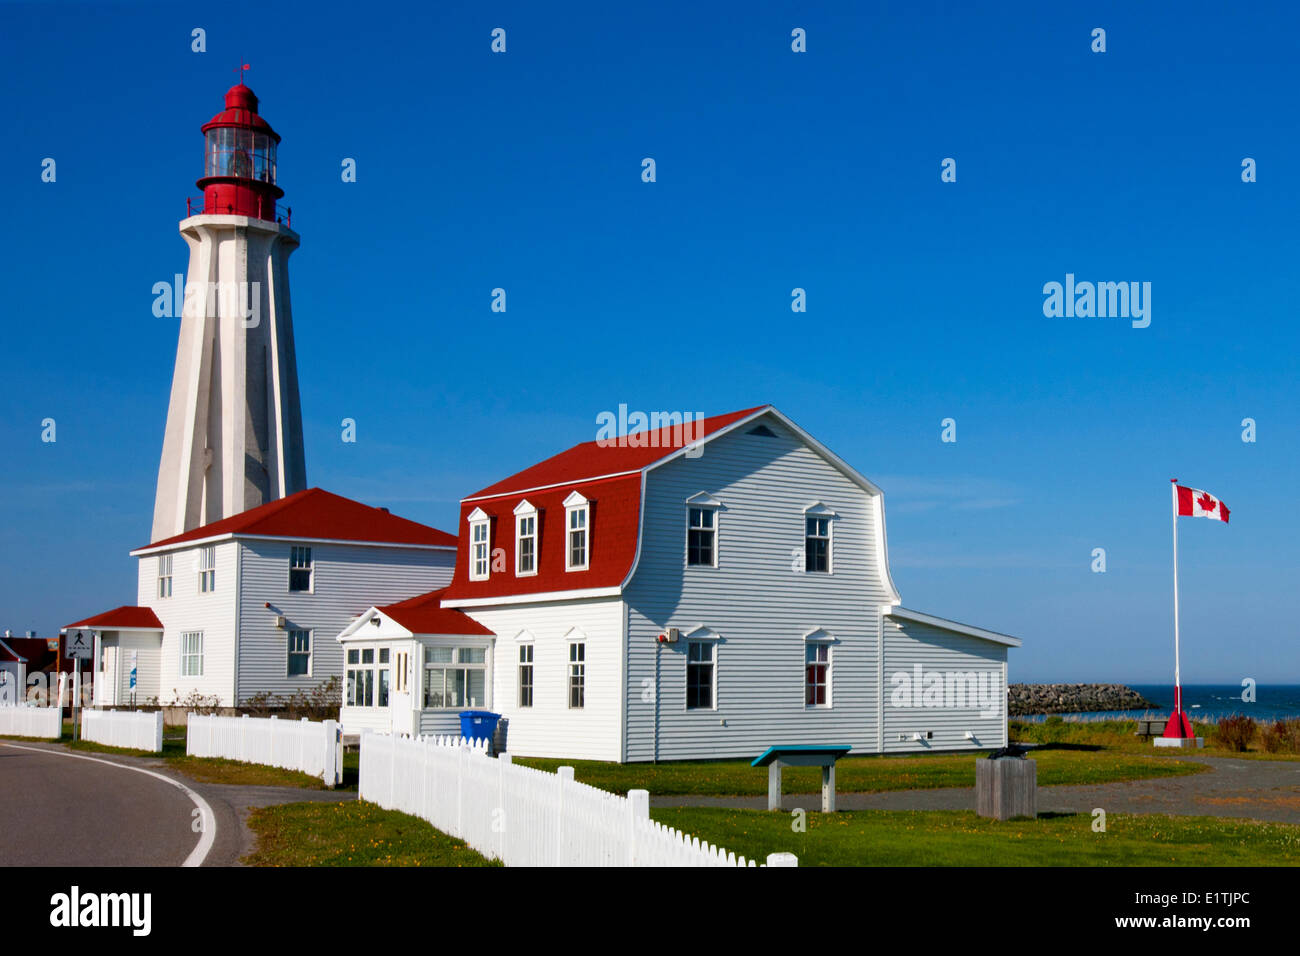 Lighthouse at Pointe-au-Père Maritime Historic Site,  Quebec, Canada - Stock Image